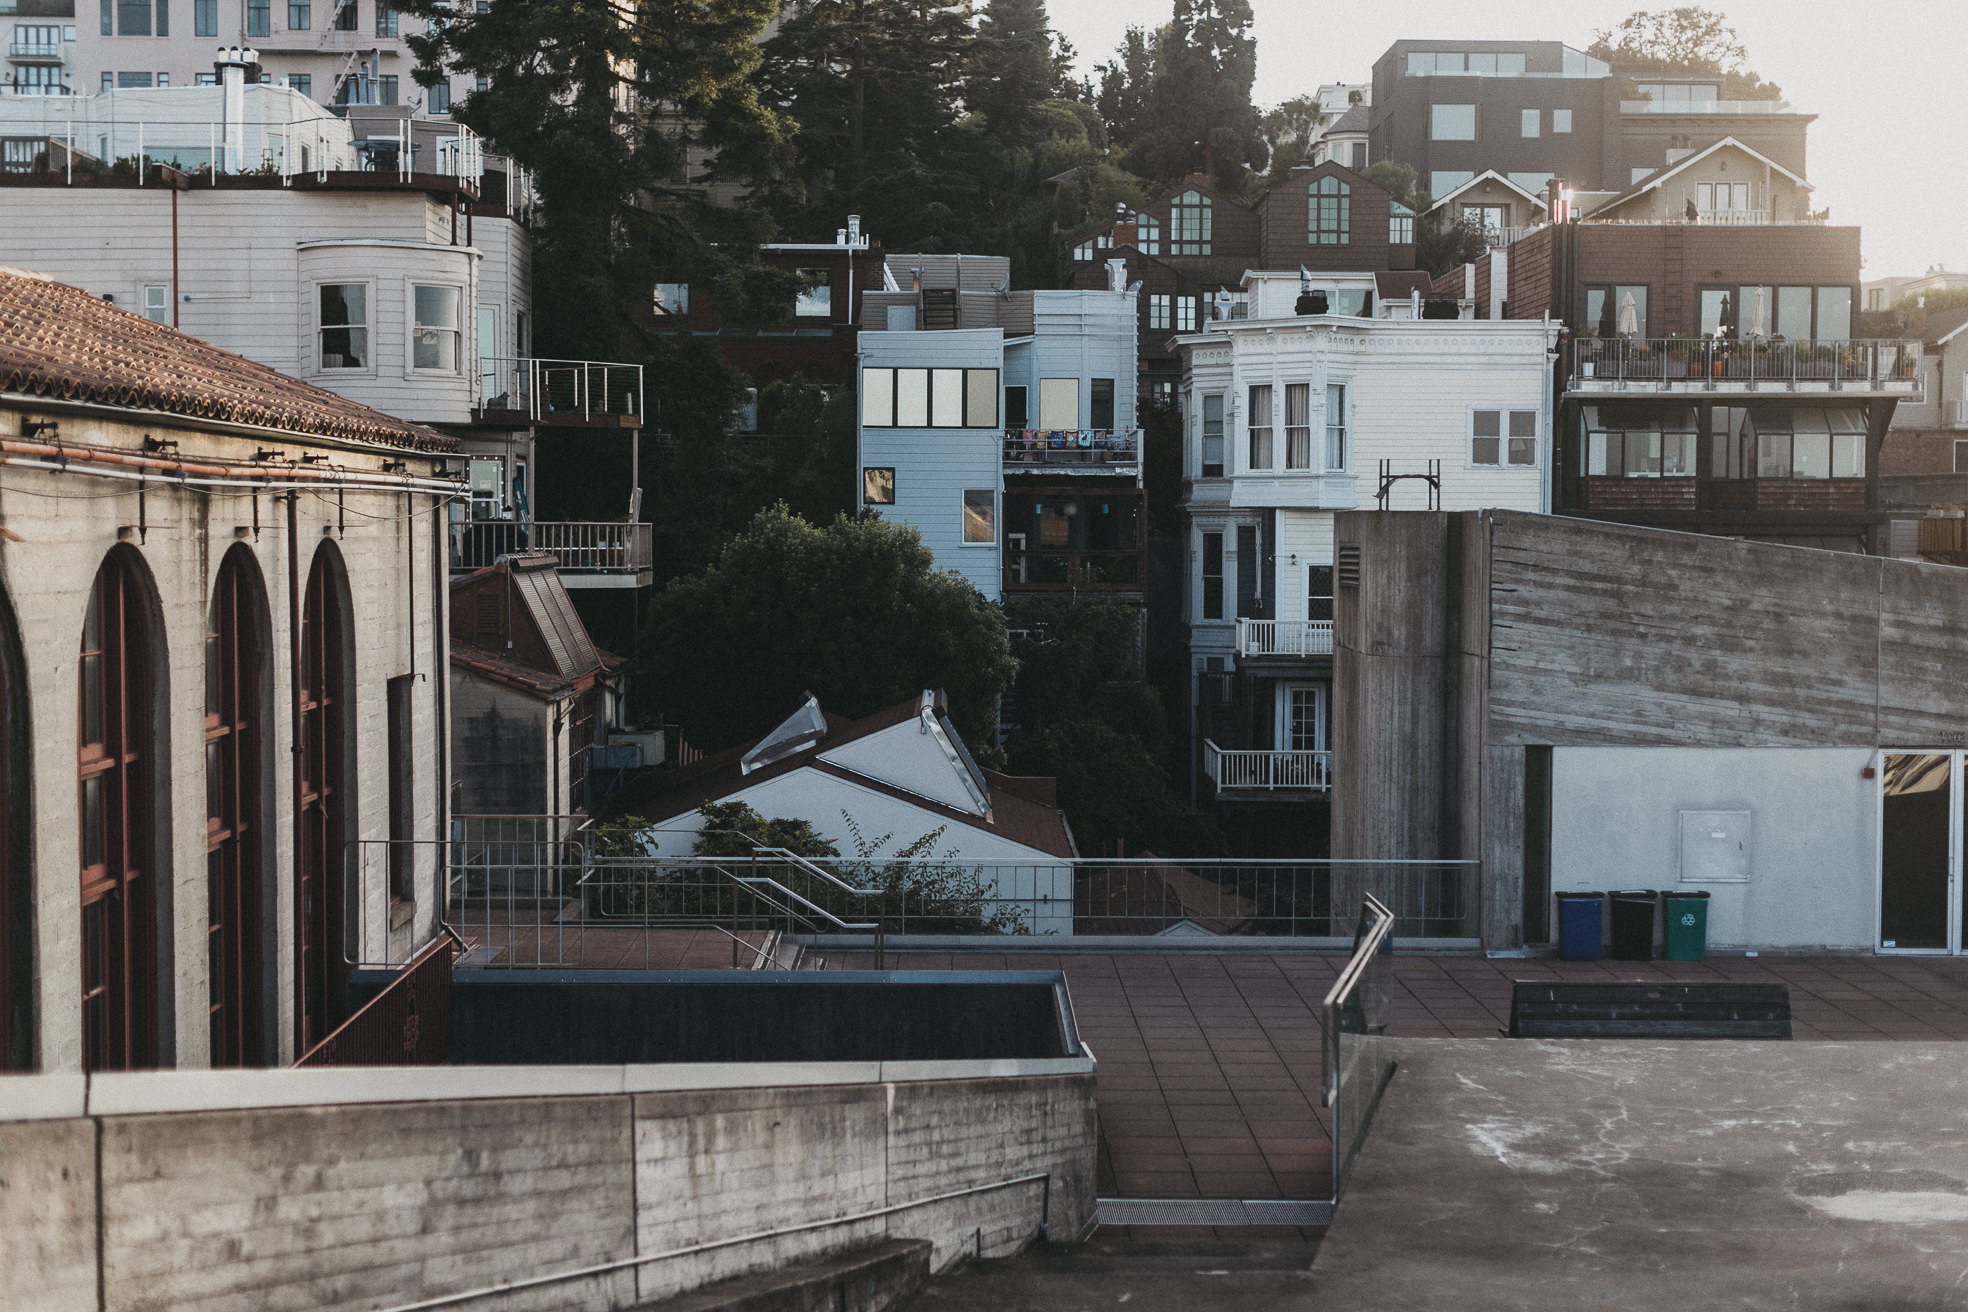 San-Francisco-BildervomLeben-9620